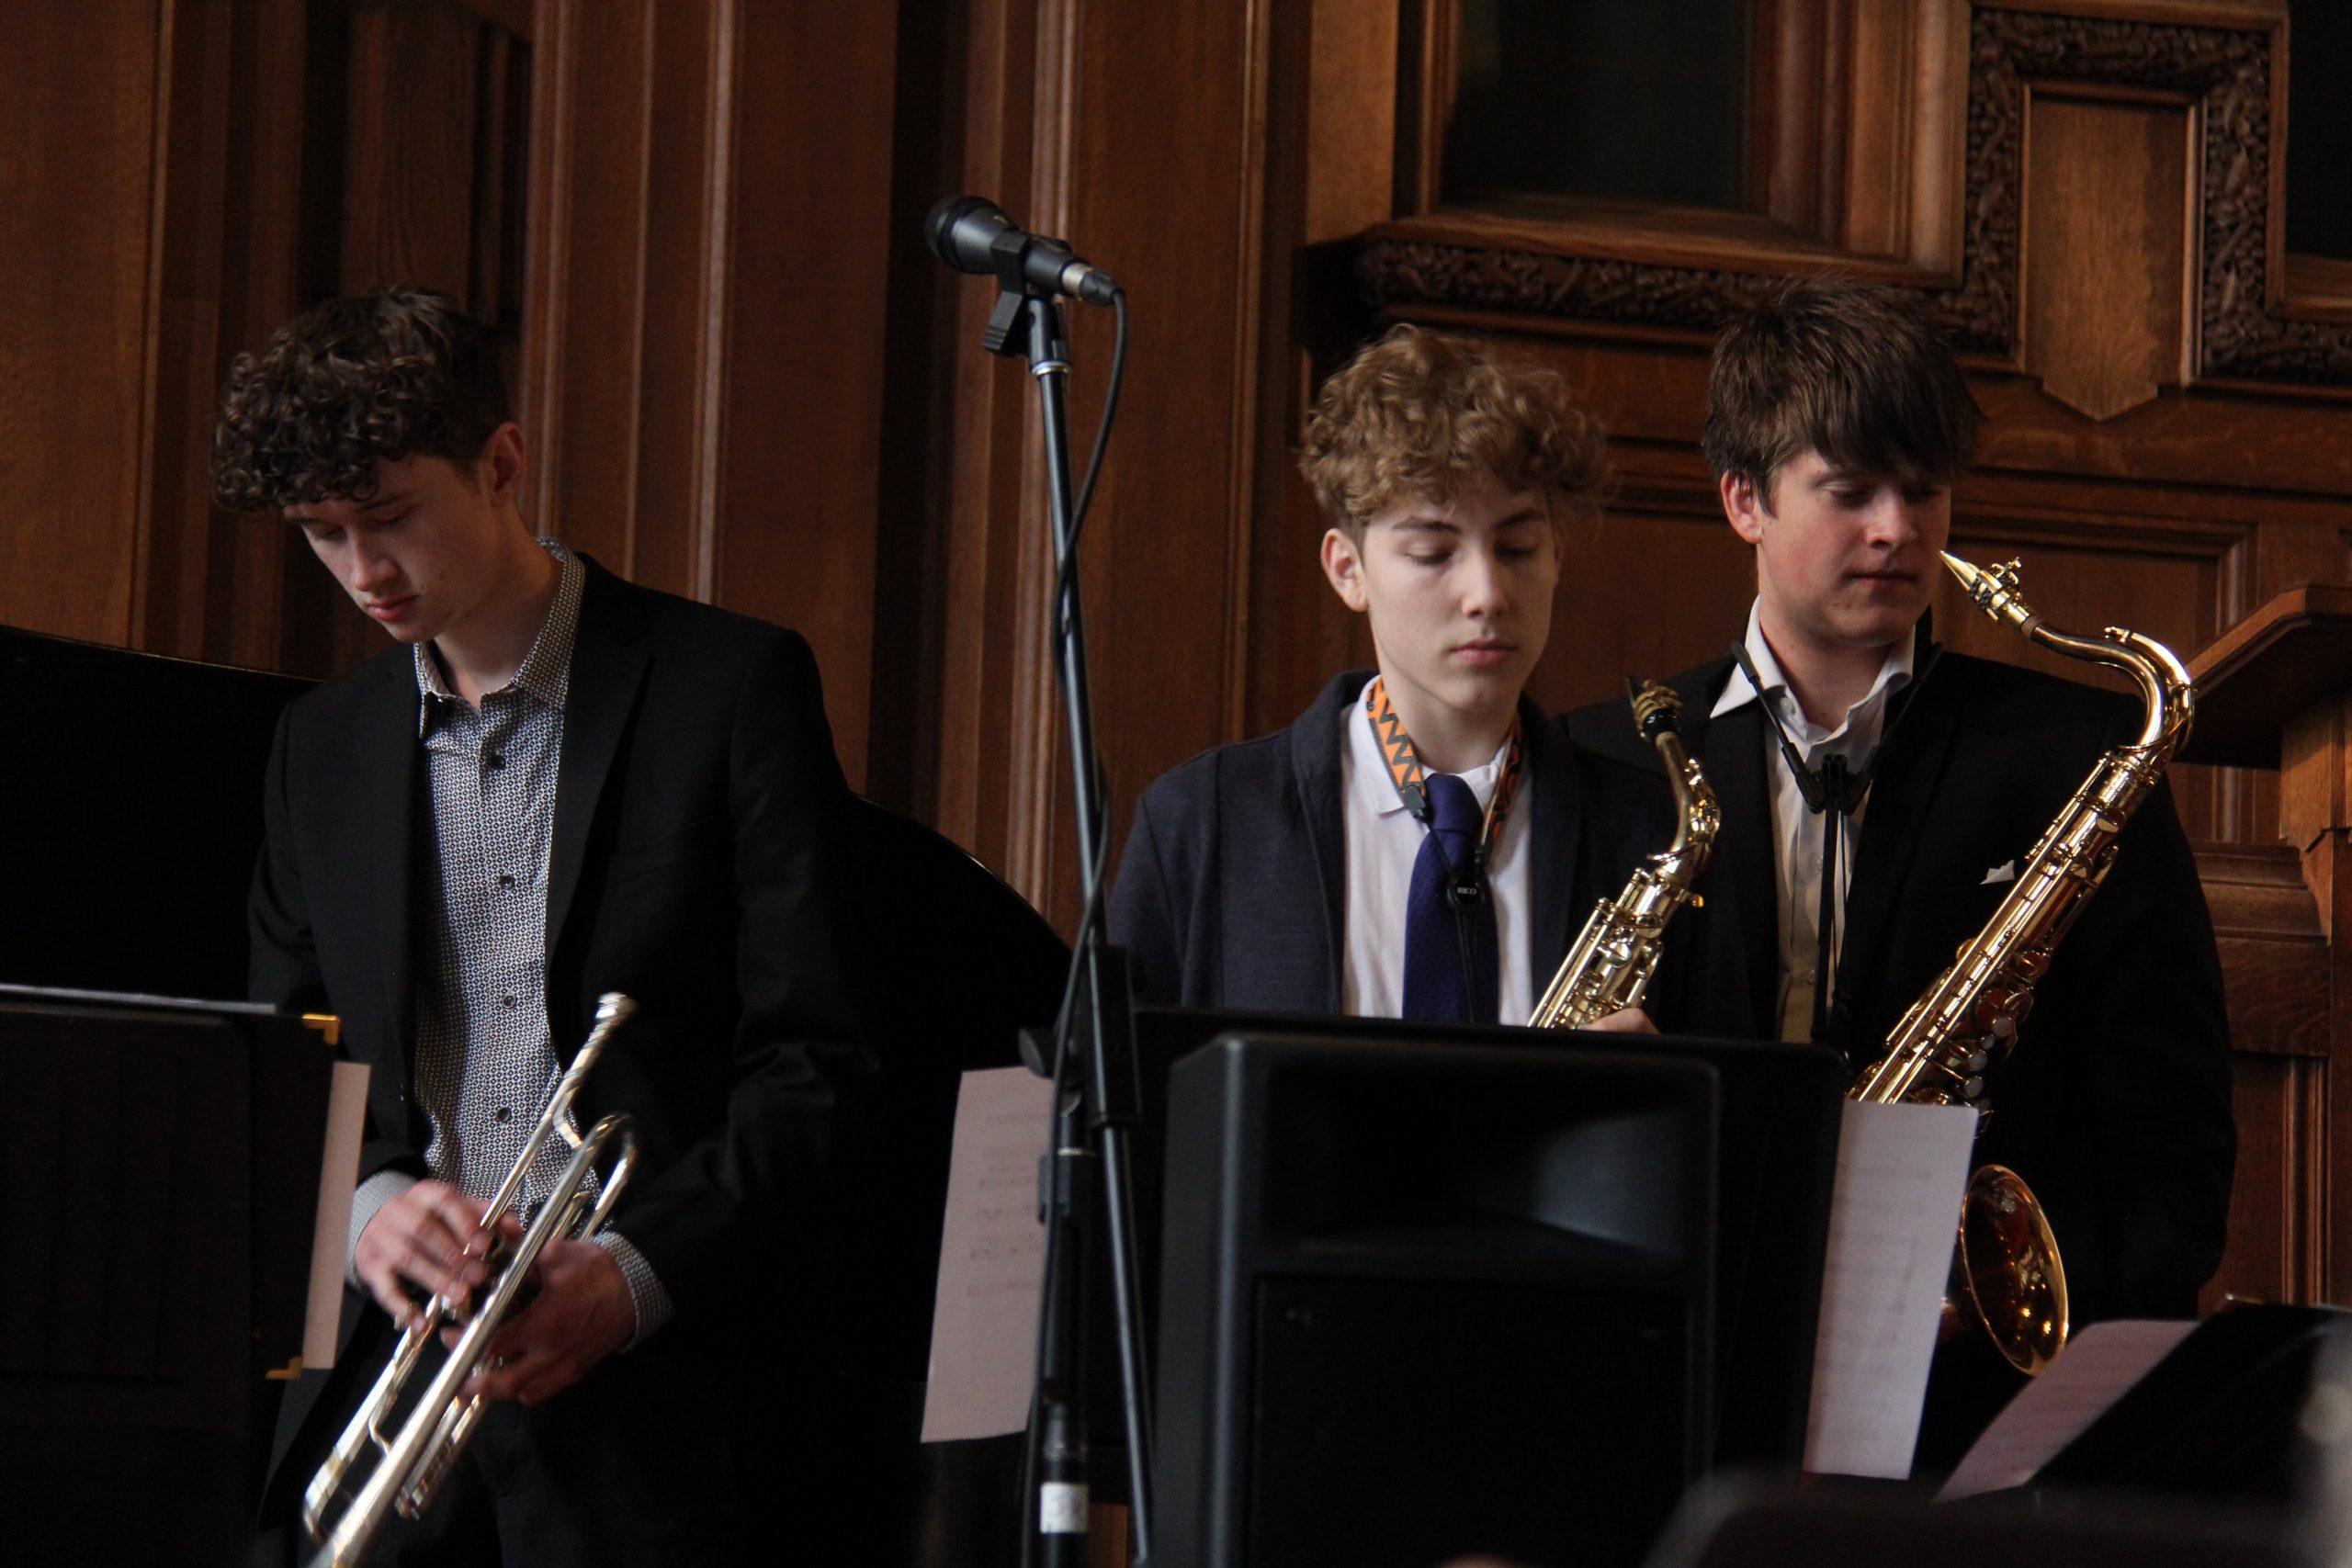 National Youth Jazz Combo (sponsored by York University)